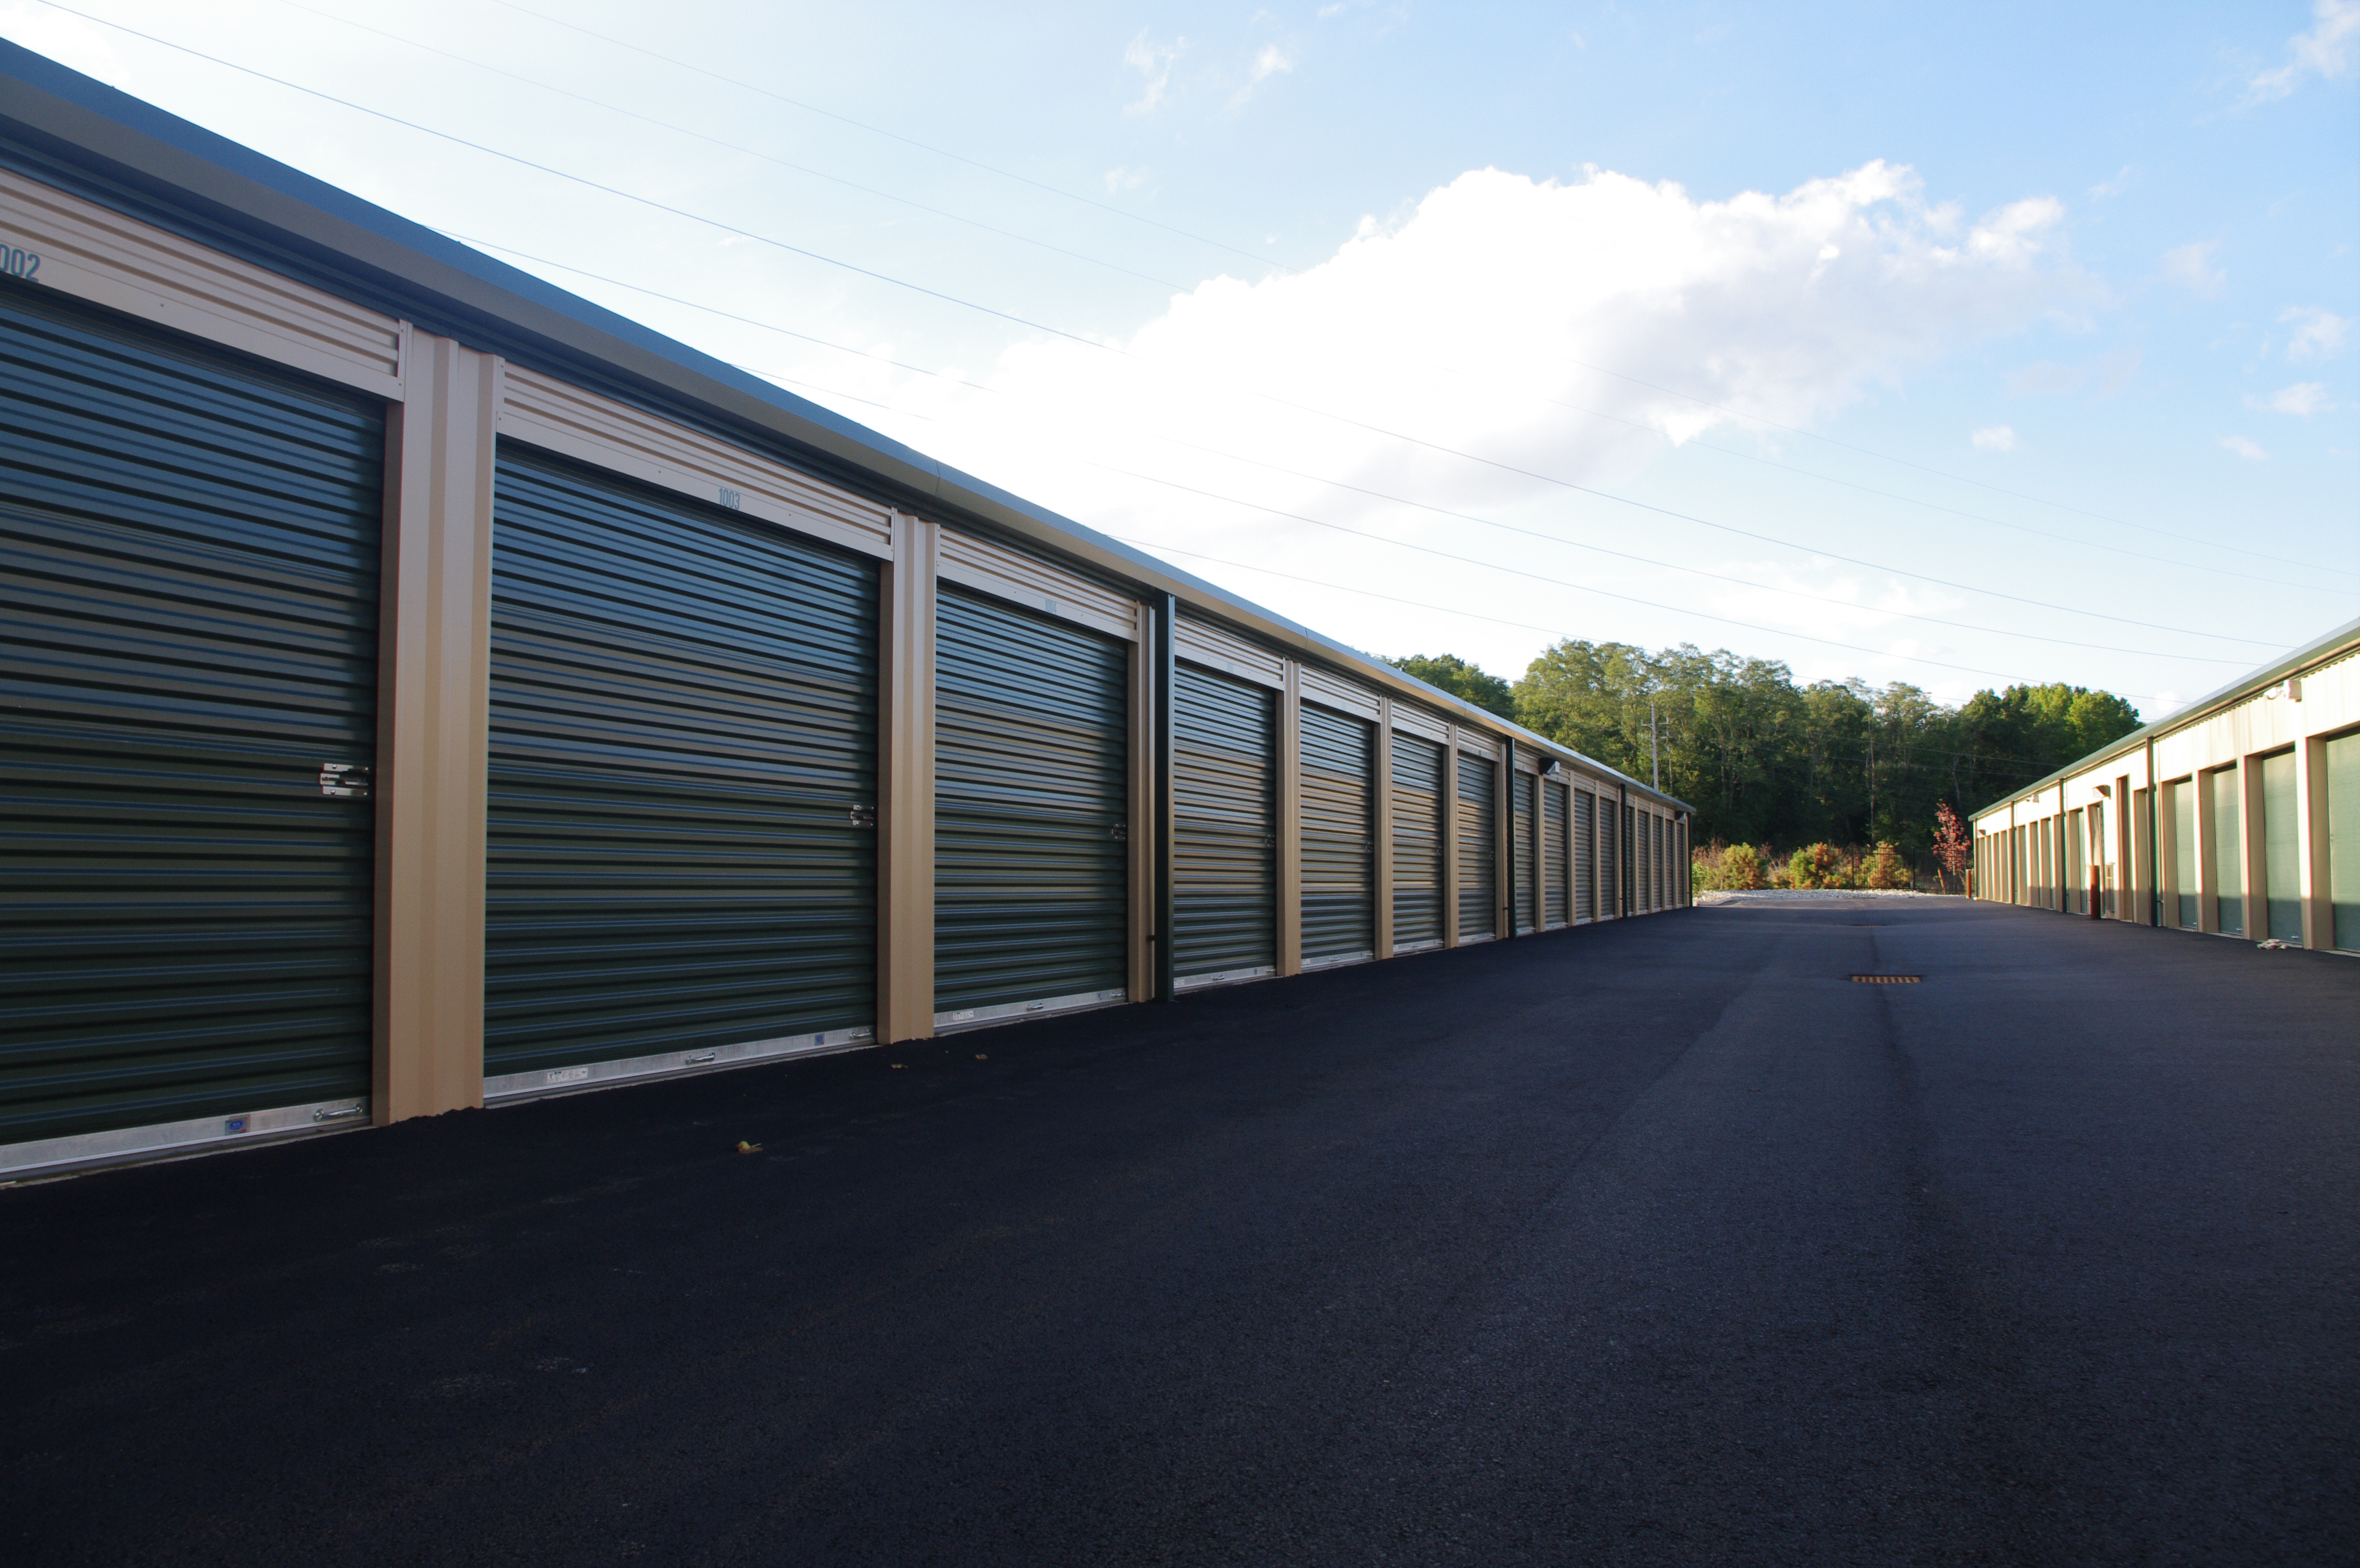 Drive Up Storage in Morganville, NJ